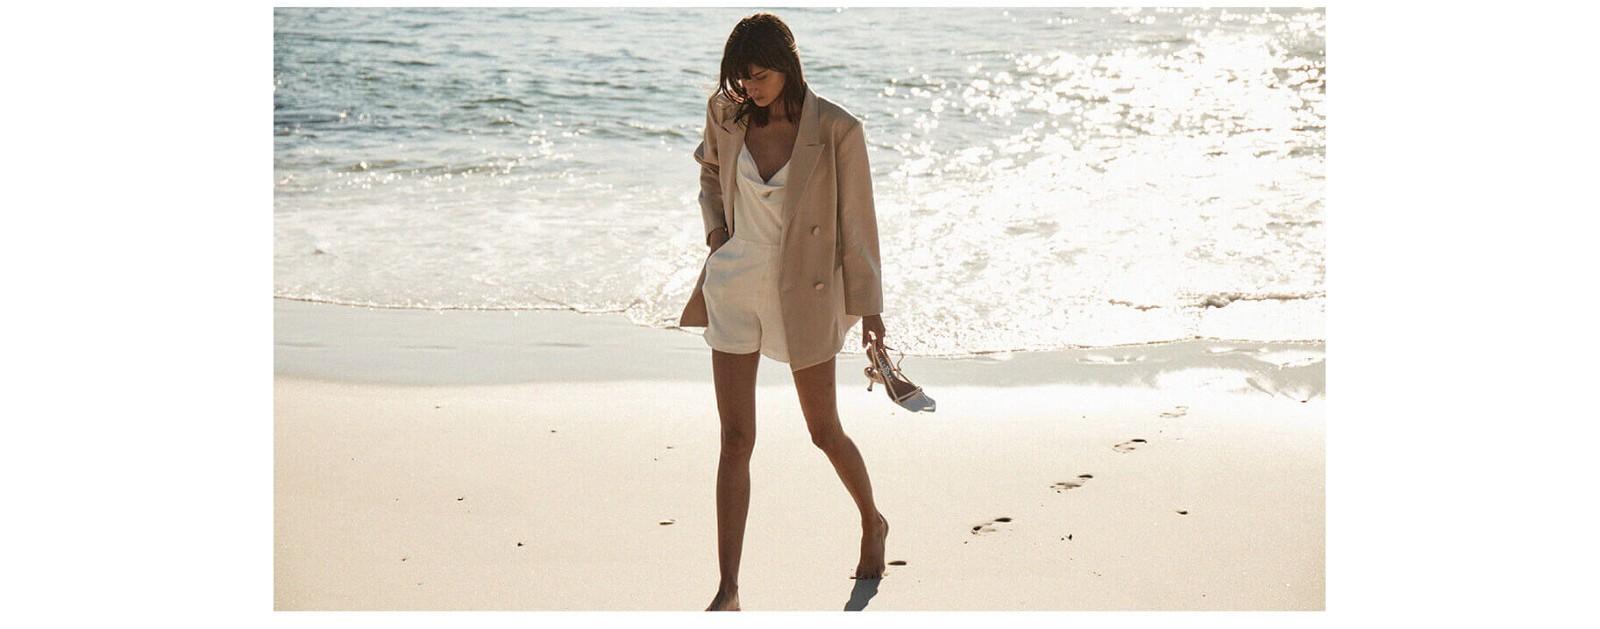 Bardot woman walking on beach in beige romper and blazer carrying shoes